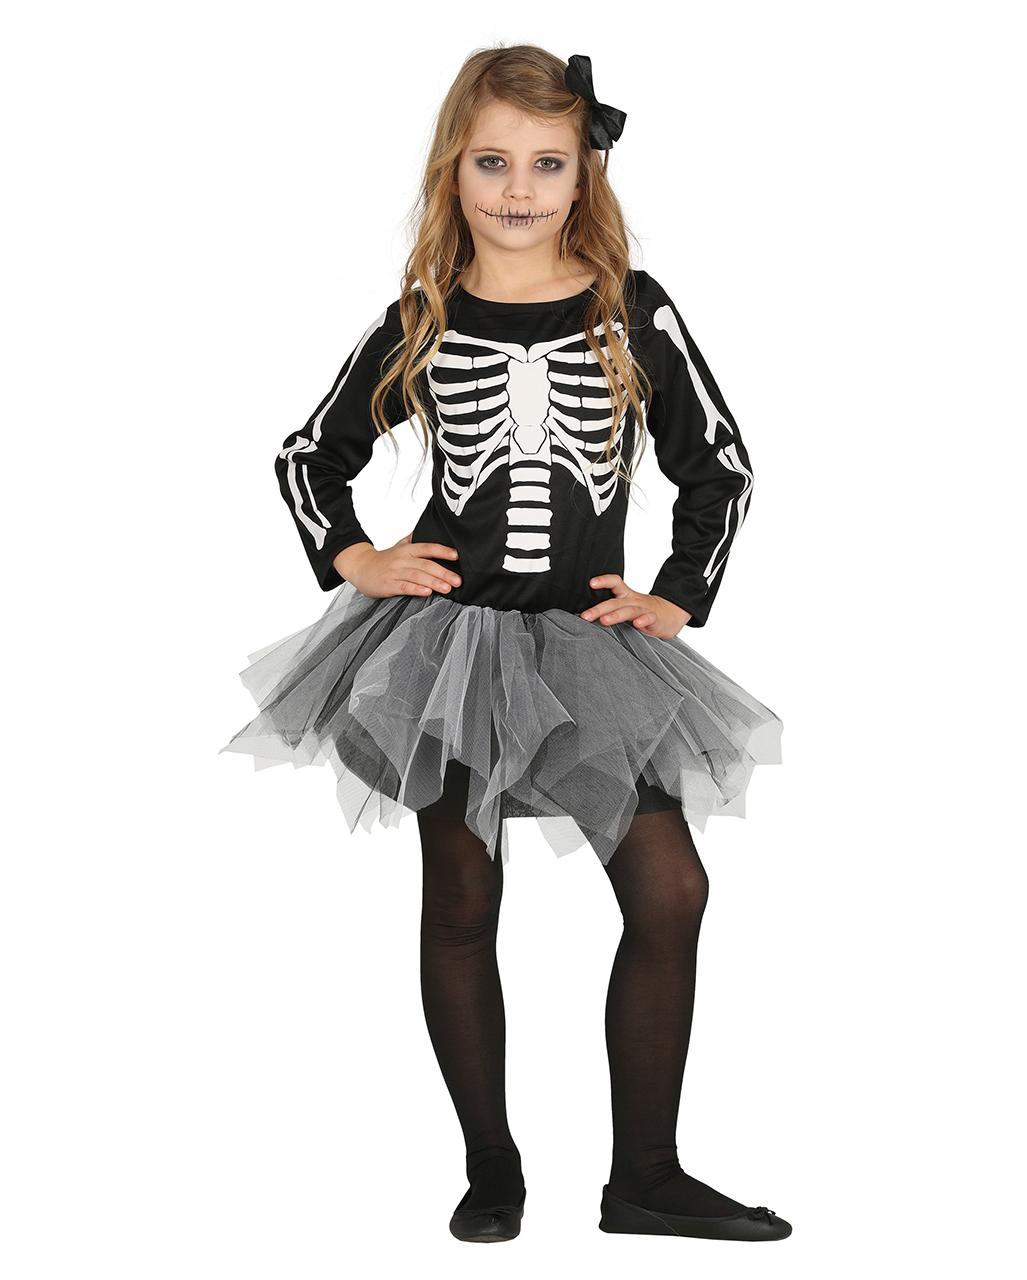 cc03f74365890 Skeleton Ballerina With Tutu Child Costume purchase | horror-shop.com